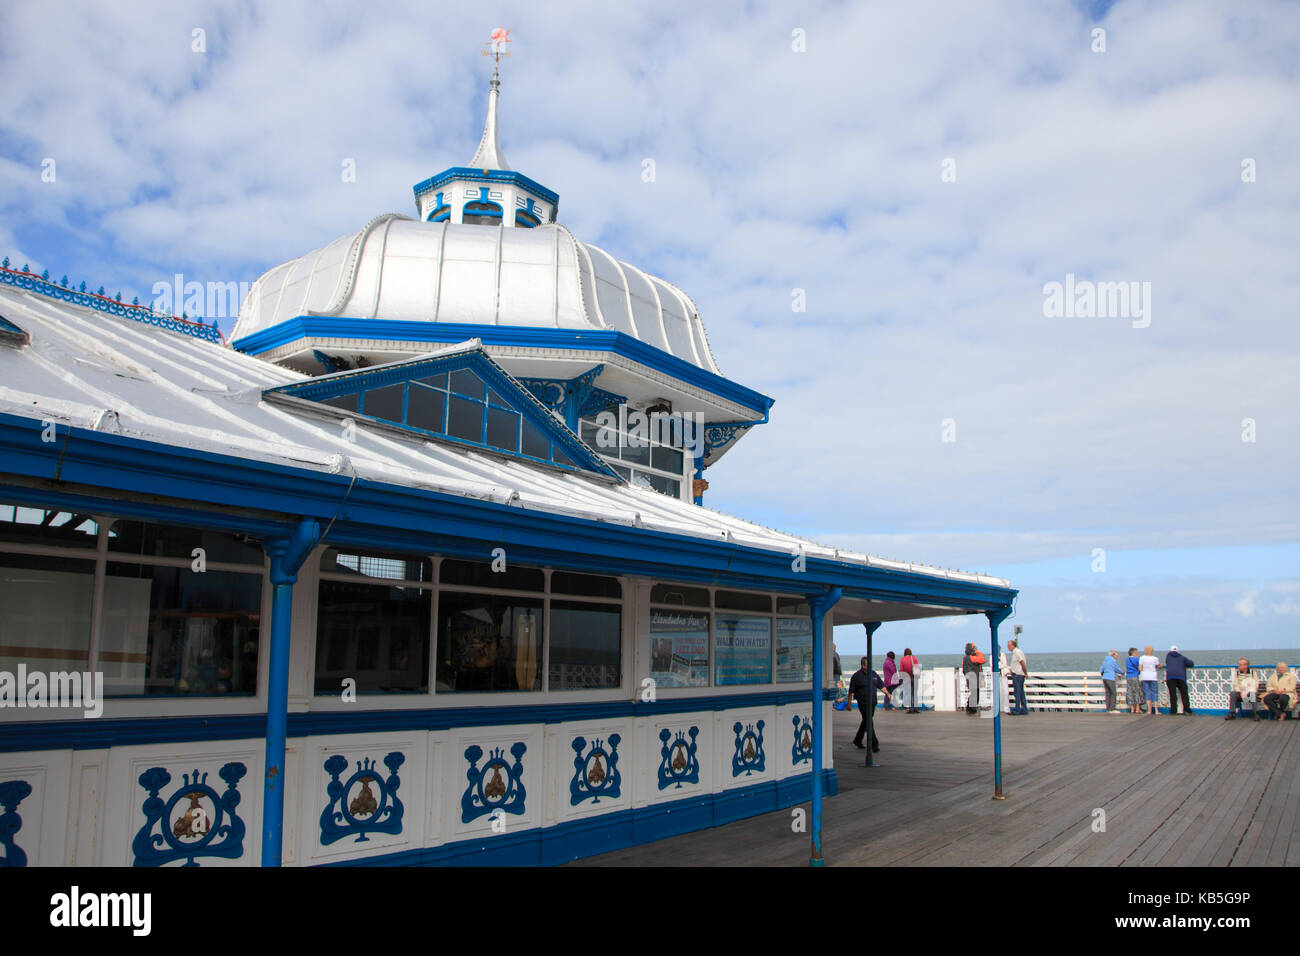 Victorian era Pier, Llandudno, Conwy County, North Wales, Wales, United Kingdom, Europe Stock Photo